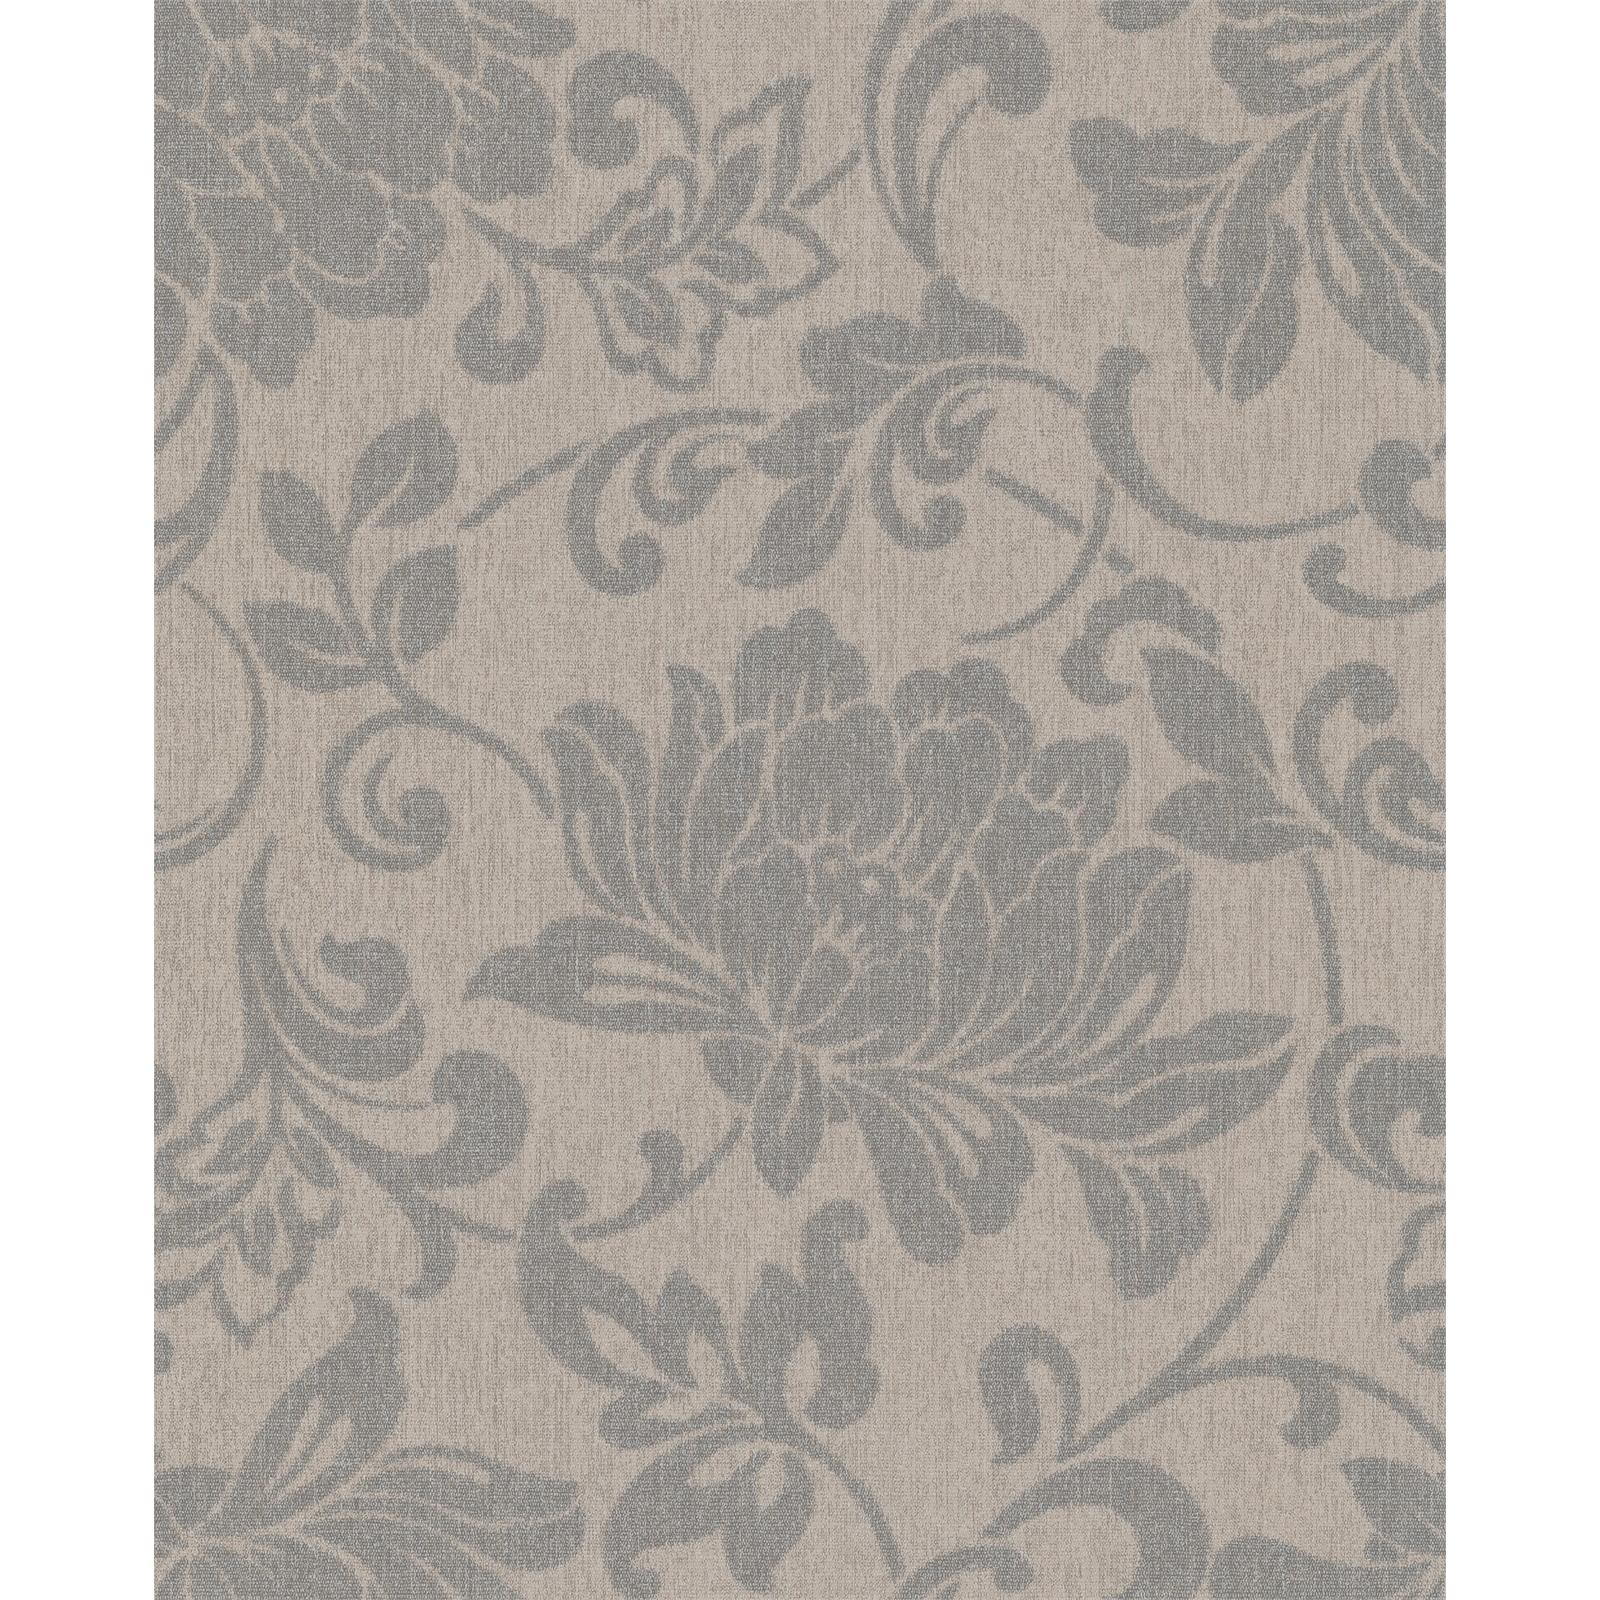 Superfresco Easy Jacquard Natural Wallpaper - Sample Jacquard Natural